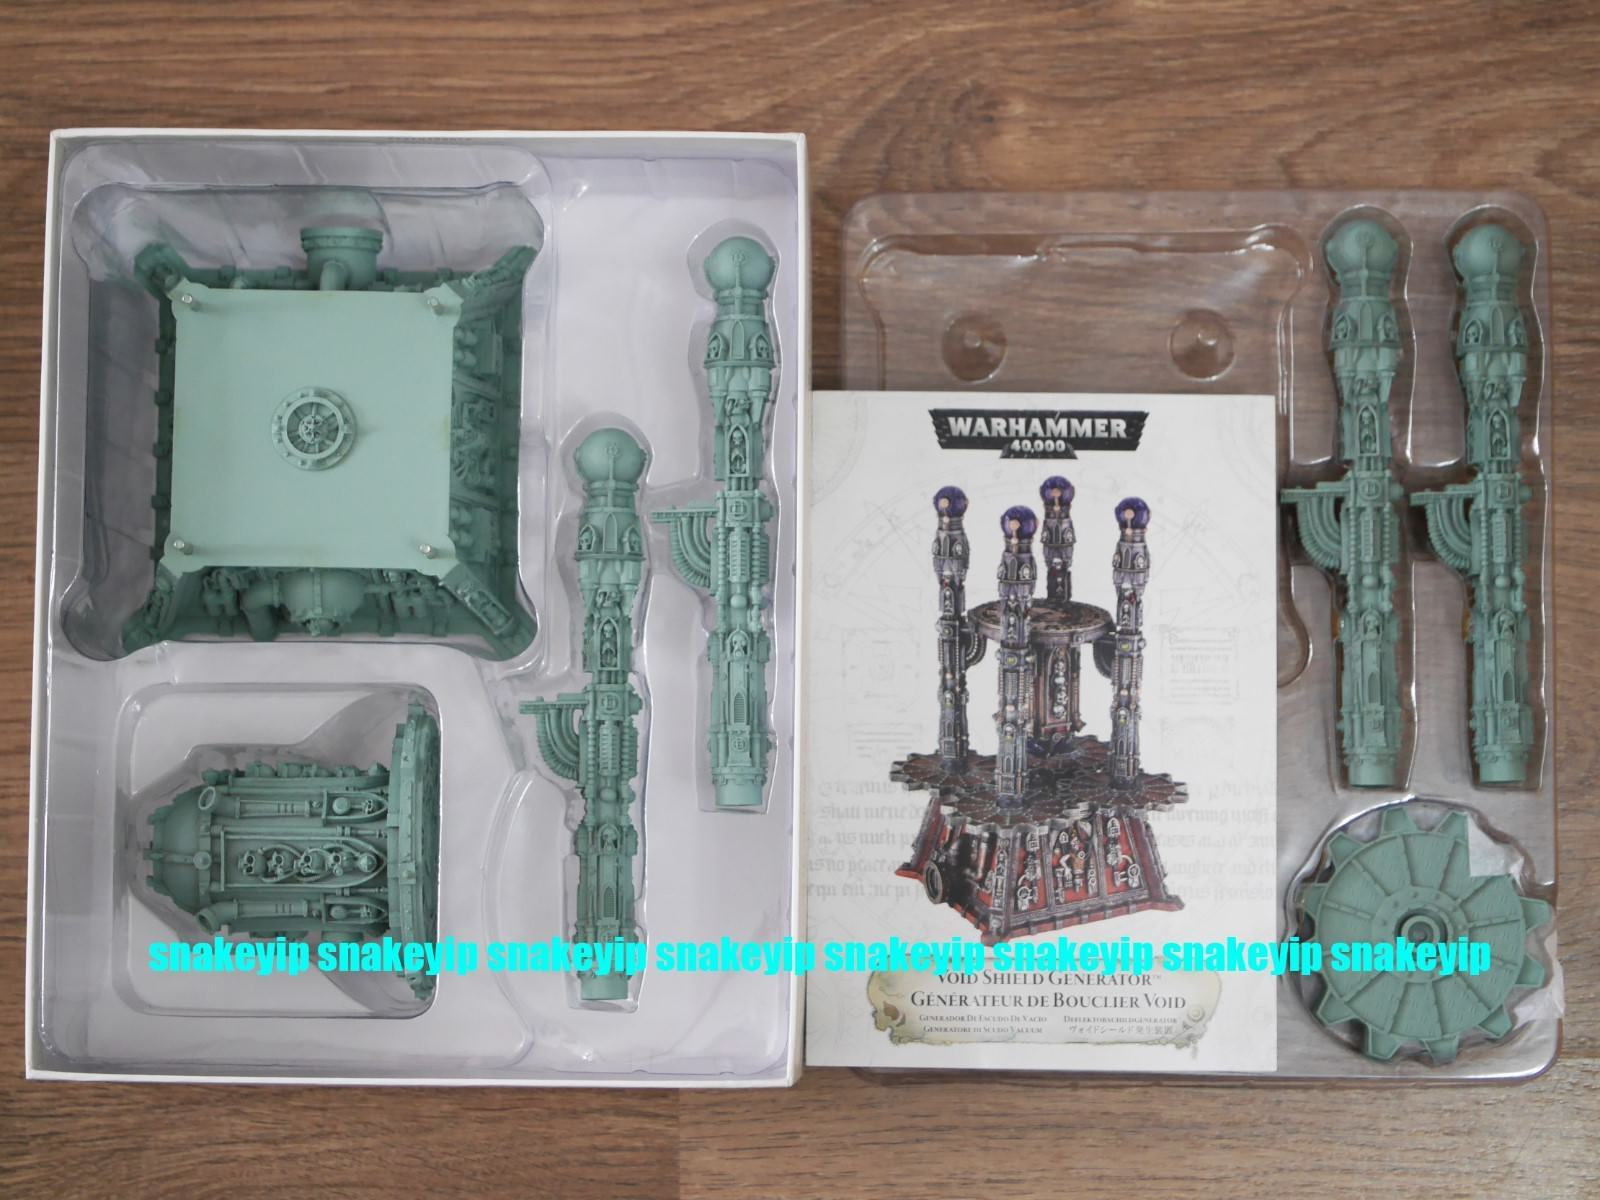 Games Workshop Warhammer 40k Void Shield Generator LTD1000 Resin Model Kit